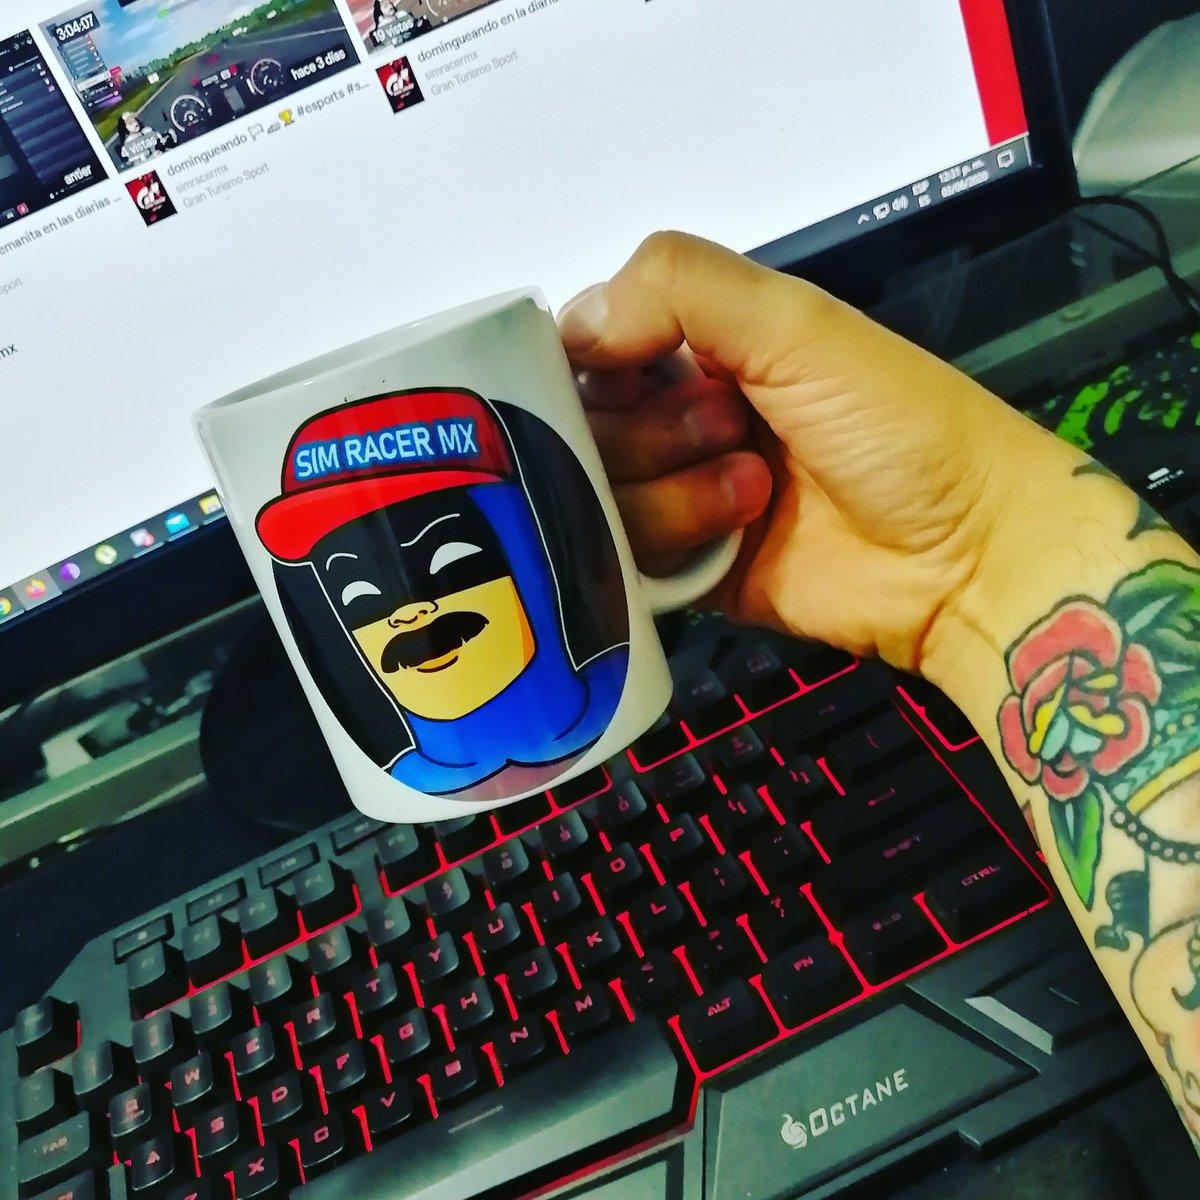 ¡Un poquito de ☕ cafeína al ⛽ tanque y vámonos reciooo!  #simracer #virtualgp #virtualrace #ps4 #esports #granturismosport #twitch #AssettoCorsa #ProjectCars2 #F12019 #ps5 https://t.co/Og6FYYxqpn